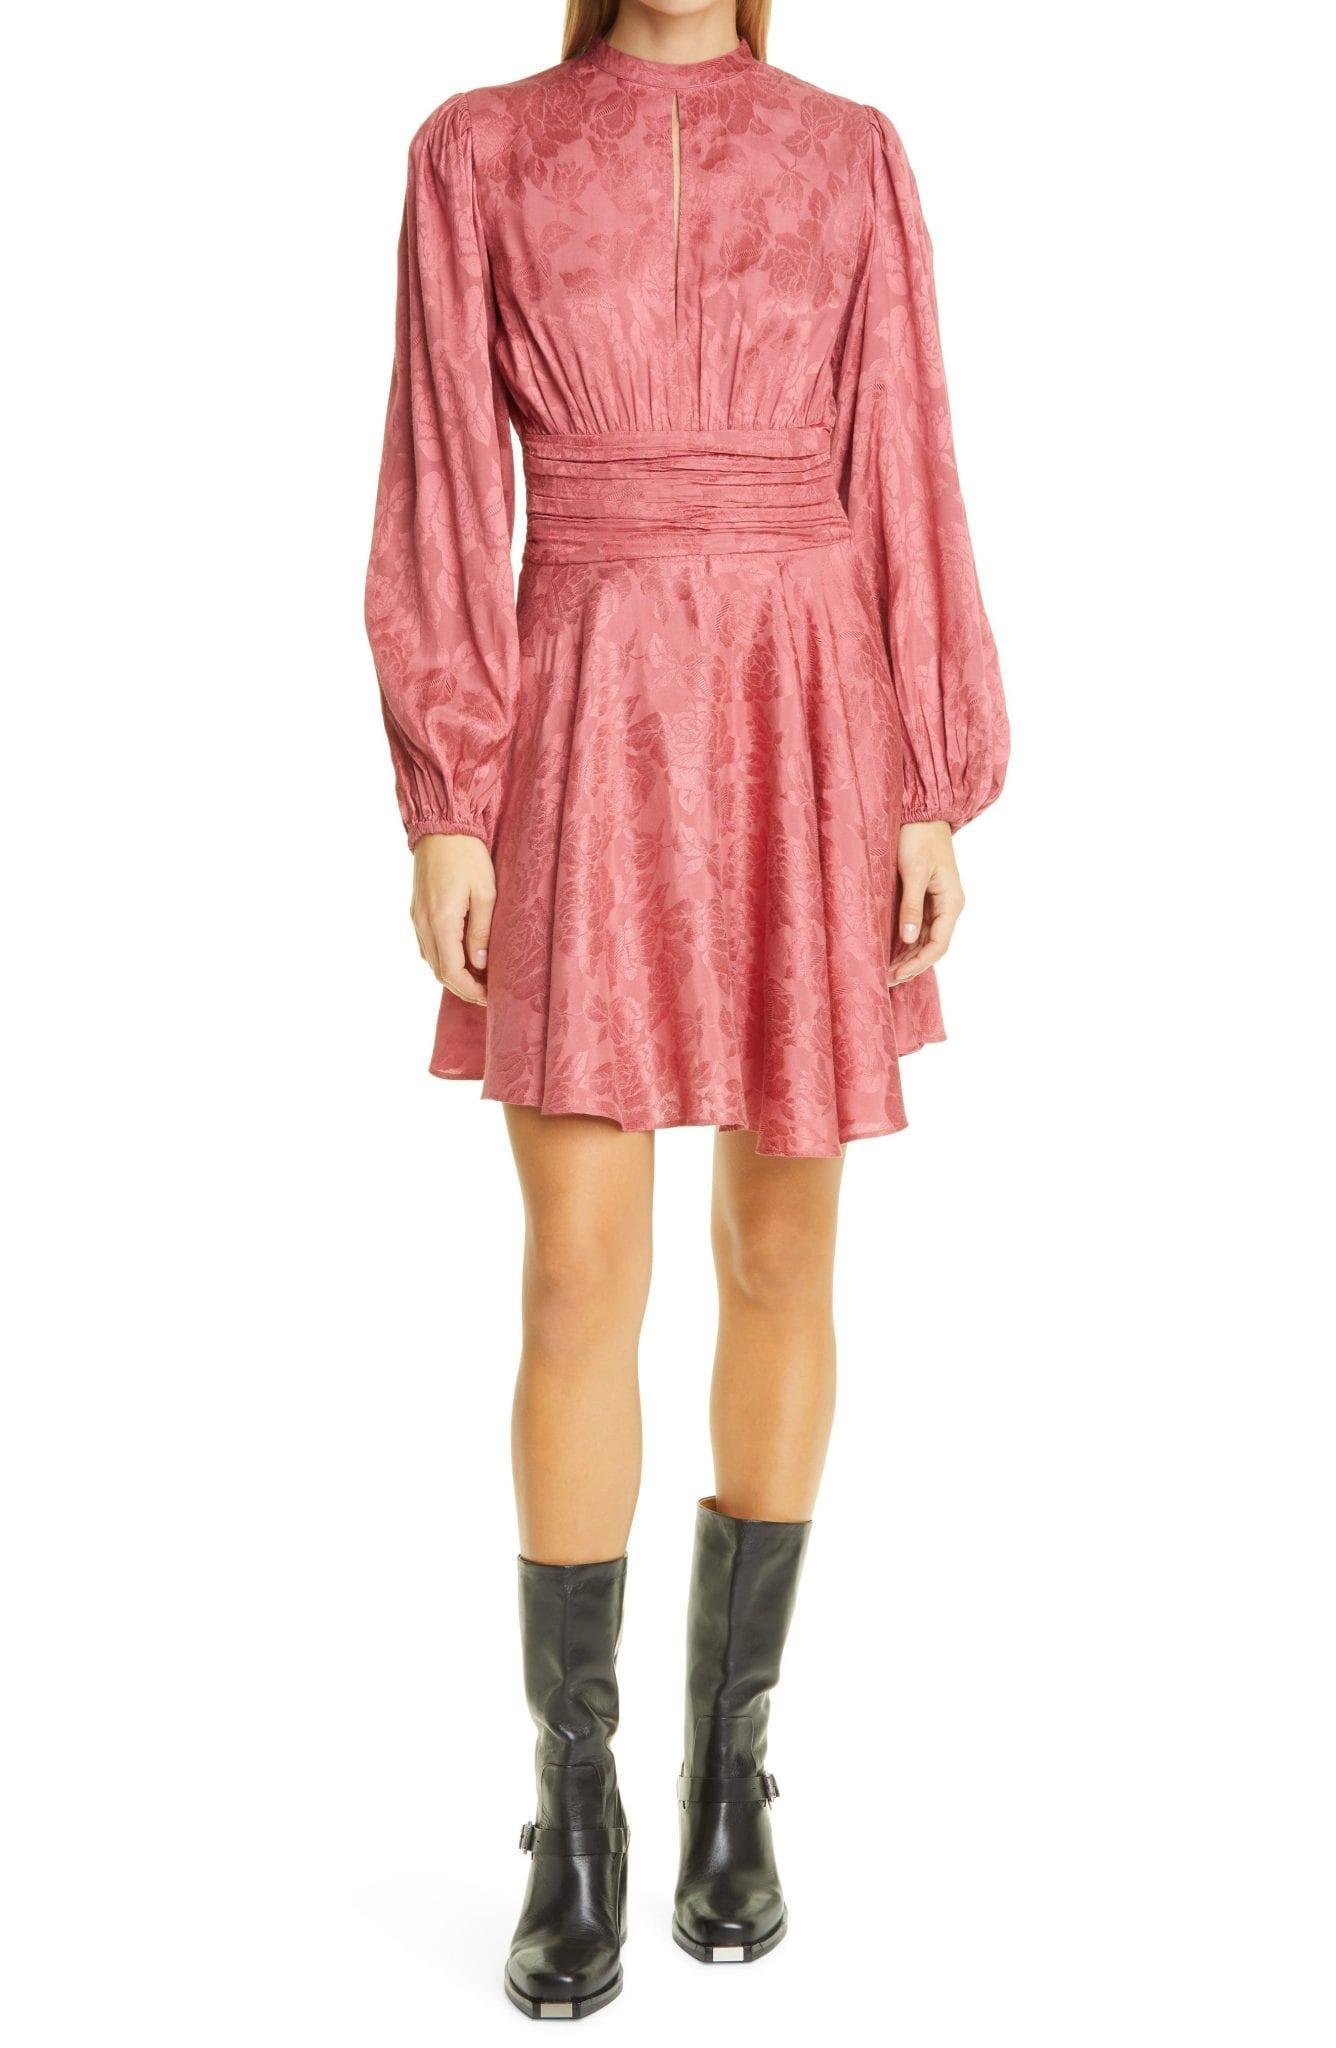 BYTIMO Jacquard Gathers Long Sleeve Mini Dress